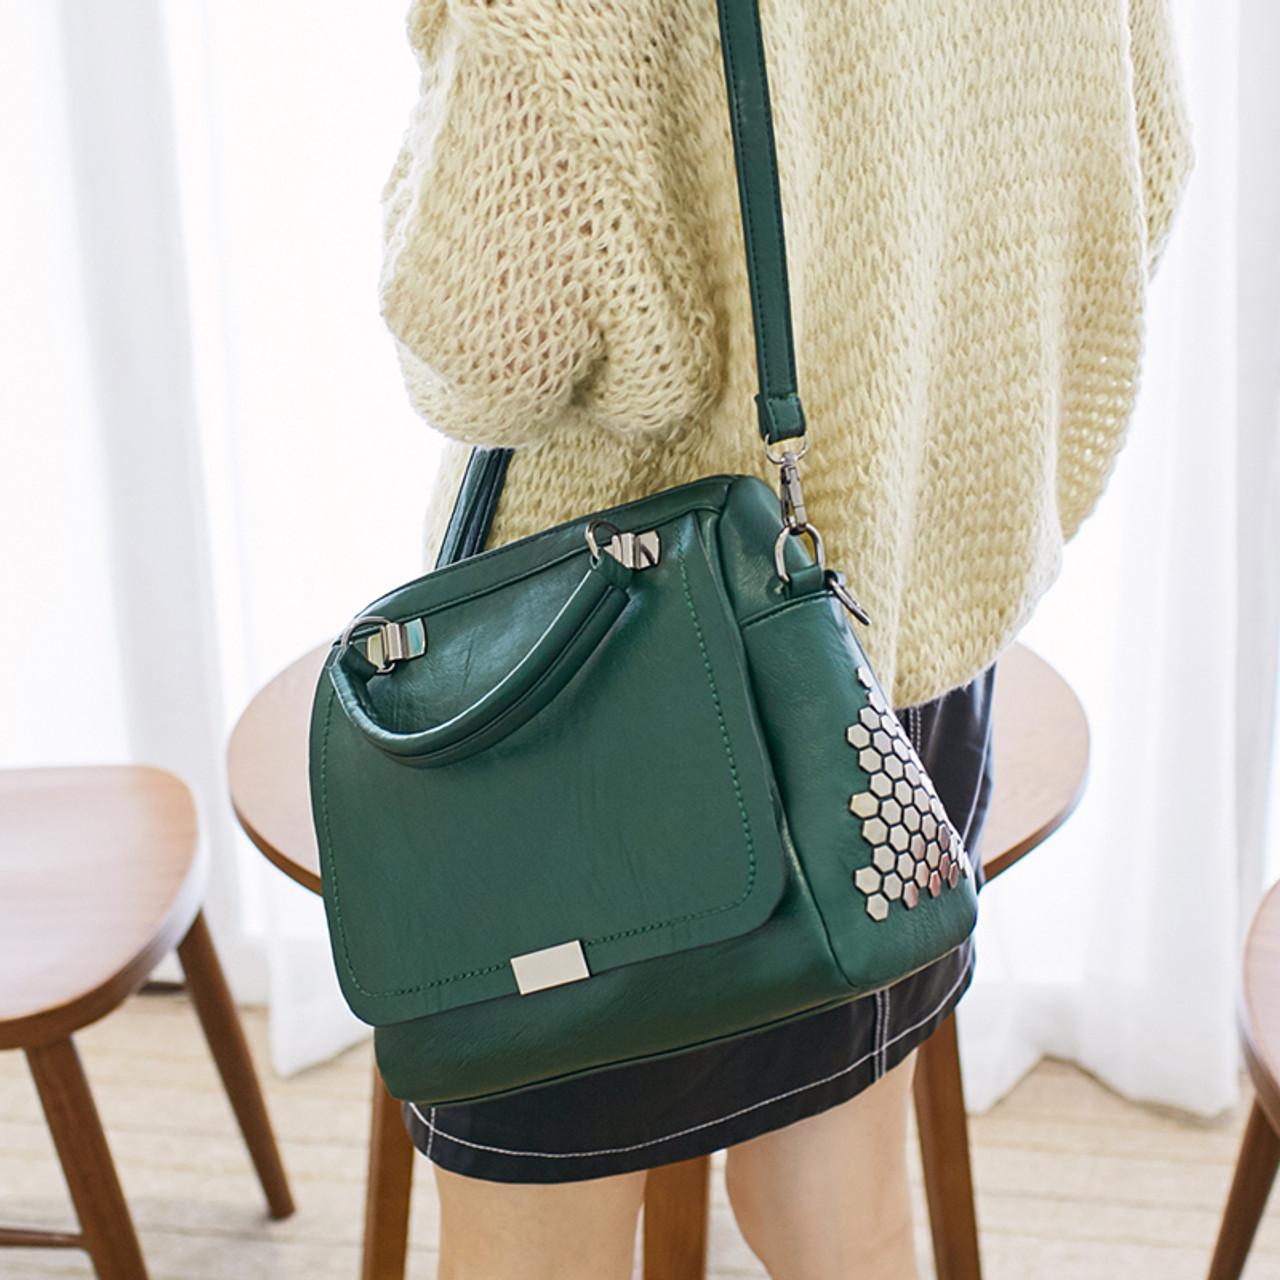 ... Bolish Casual Women Soft Pu Leather Handbag Female Shoulder Bag  Messenger Bag Larger Size Winter Women ... 2b4c6d090e